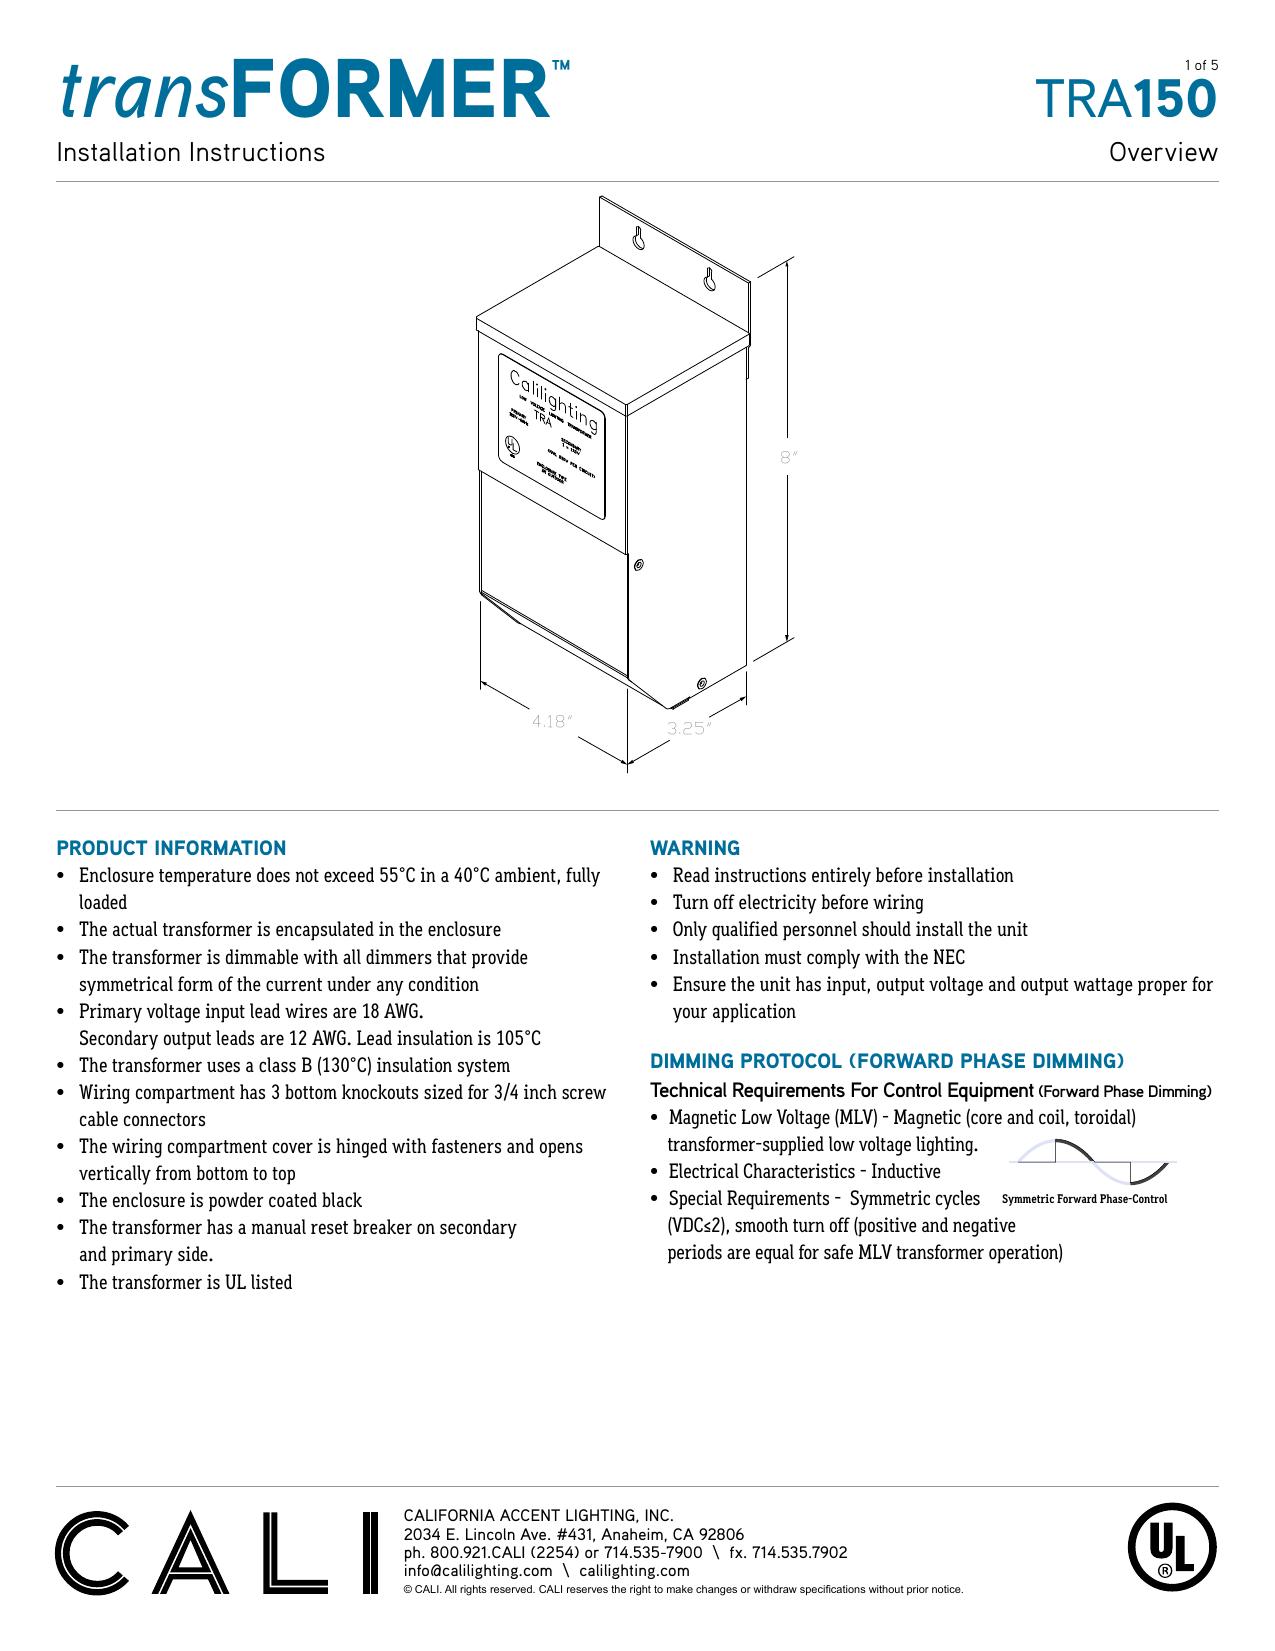 Transformer California Accent Lighting Manualzz